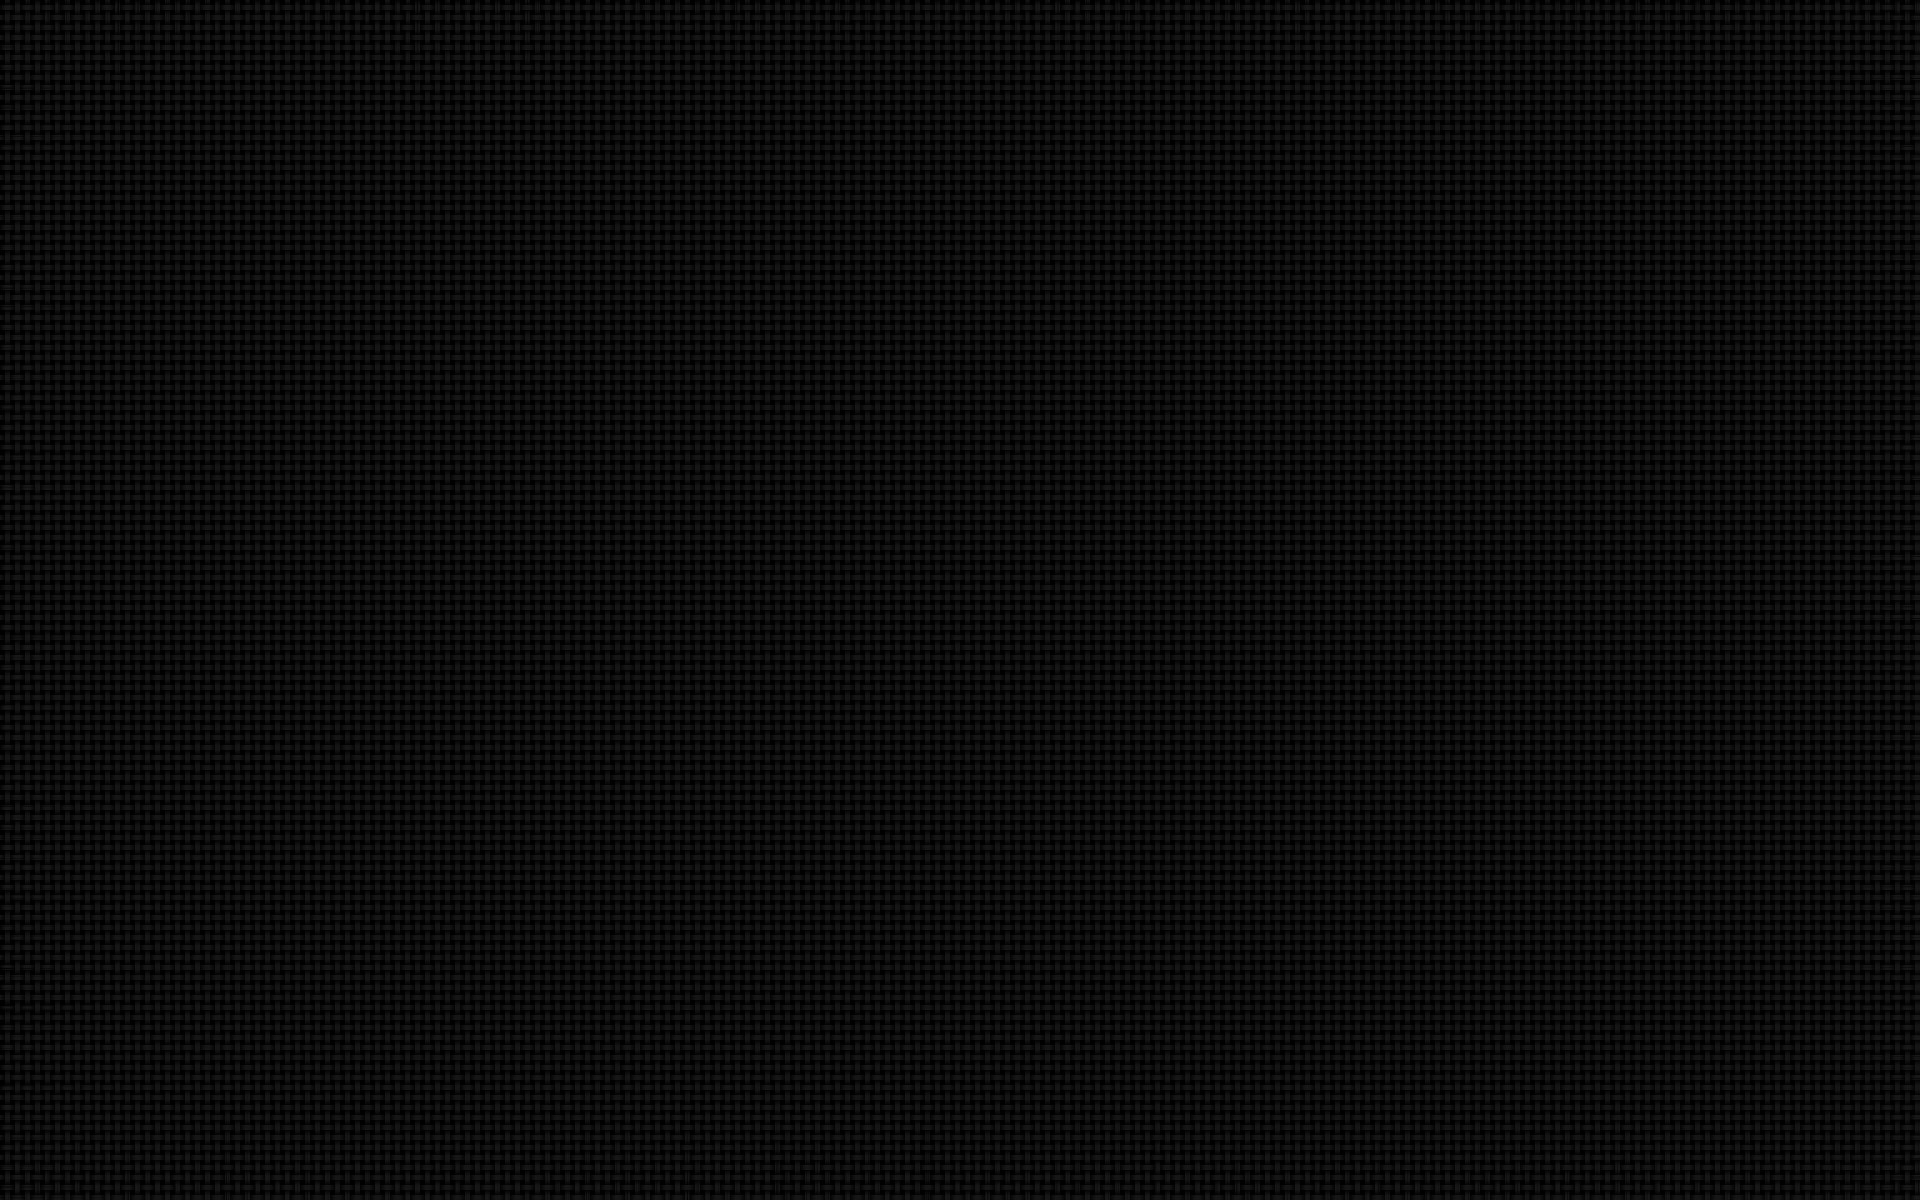 Carbon Wincustomize Explore Fiber 1102450 Wallpaper wallpaper